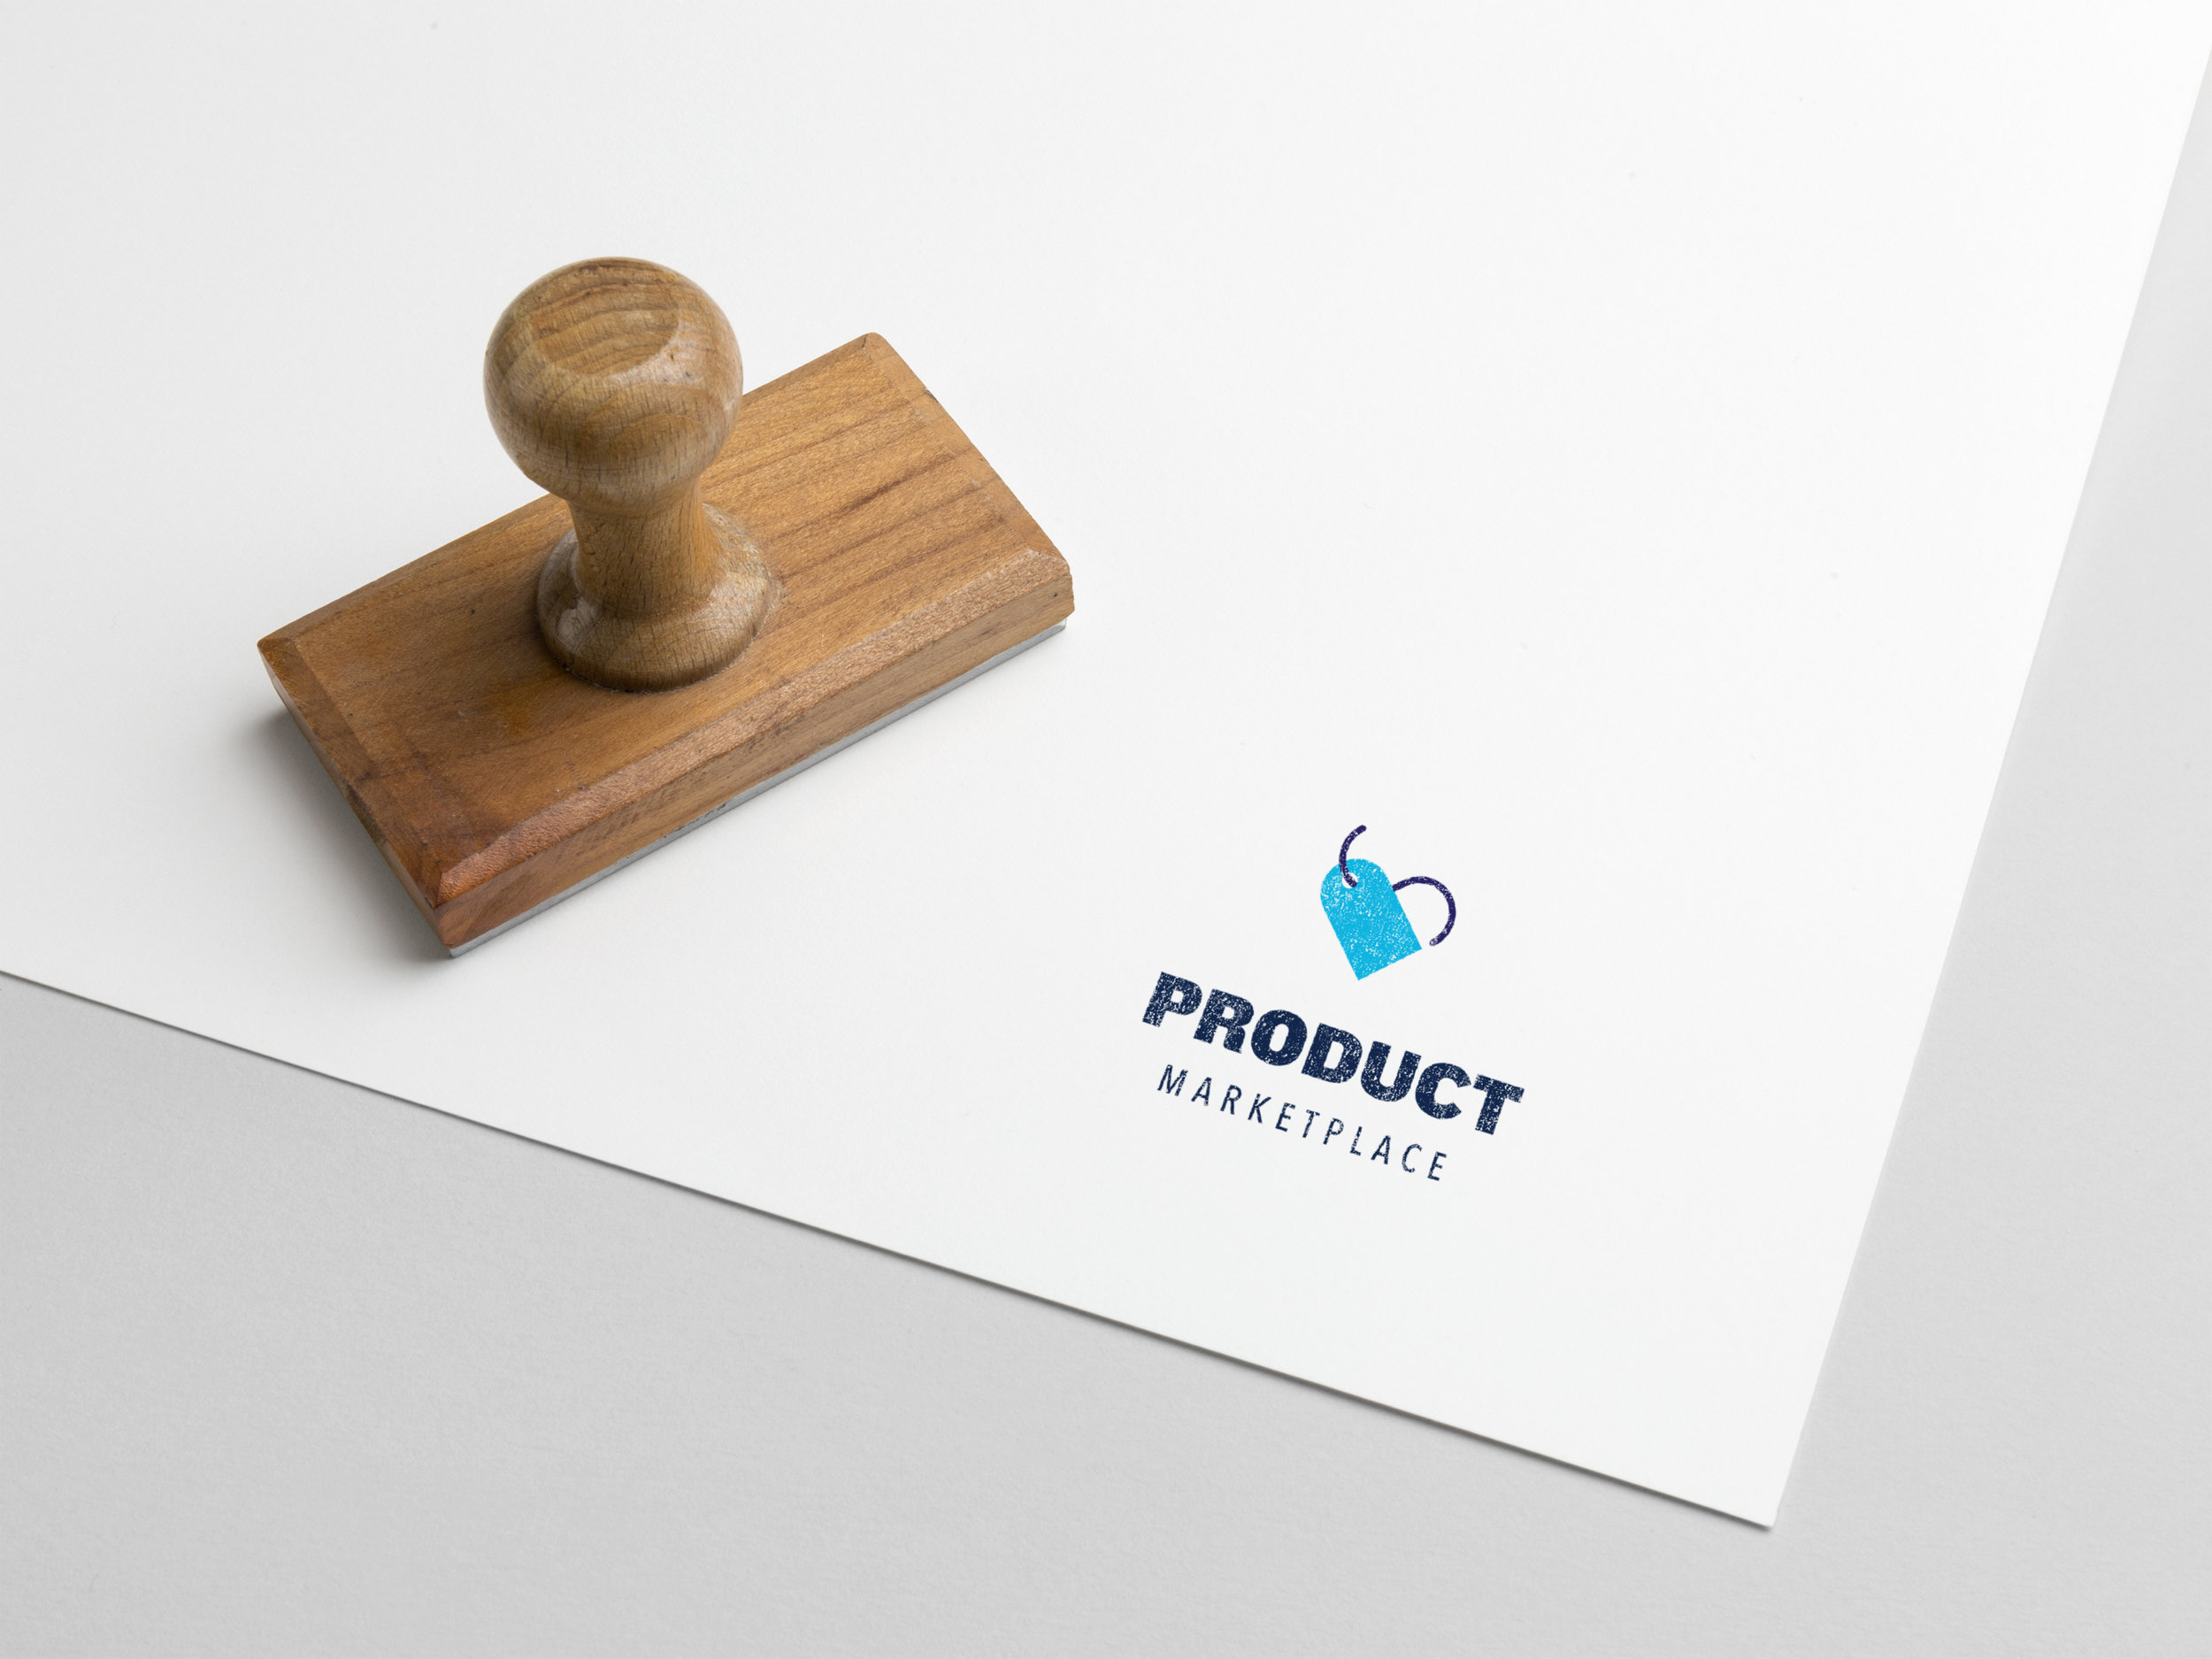 Product Marketplace